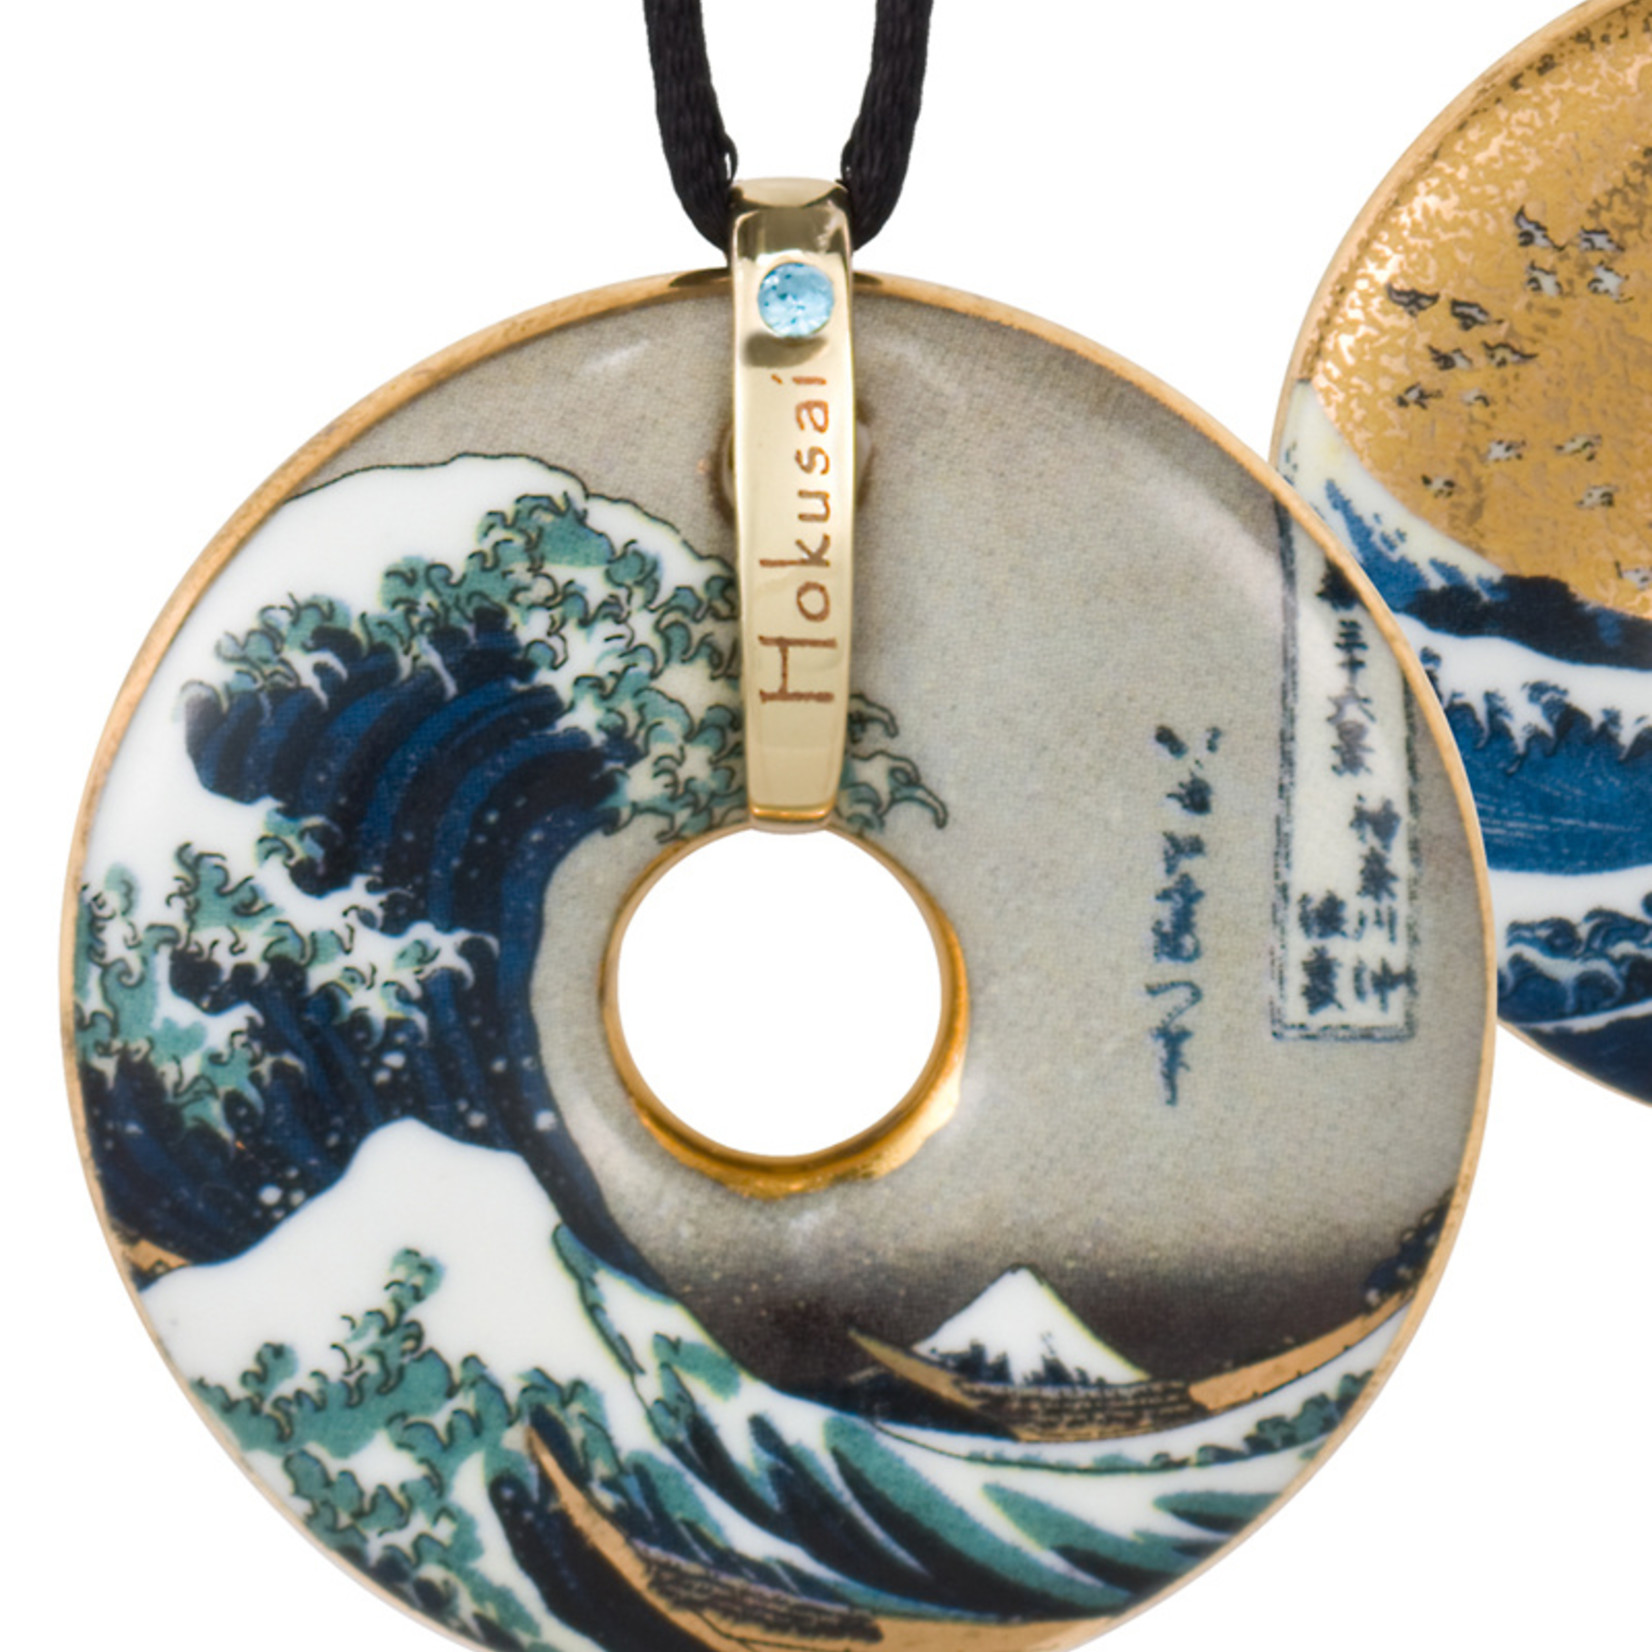 Goebel Porzellanmanufaktur Kette The Wave I Goebel Porzellan I Katsushika Hokusai